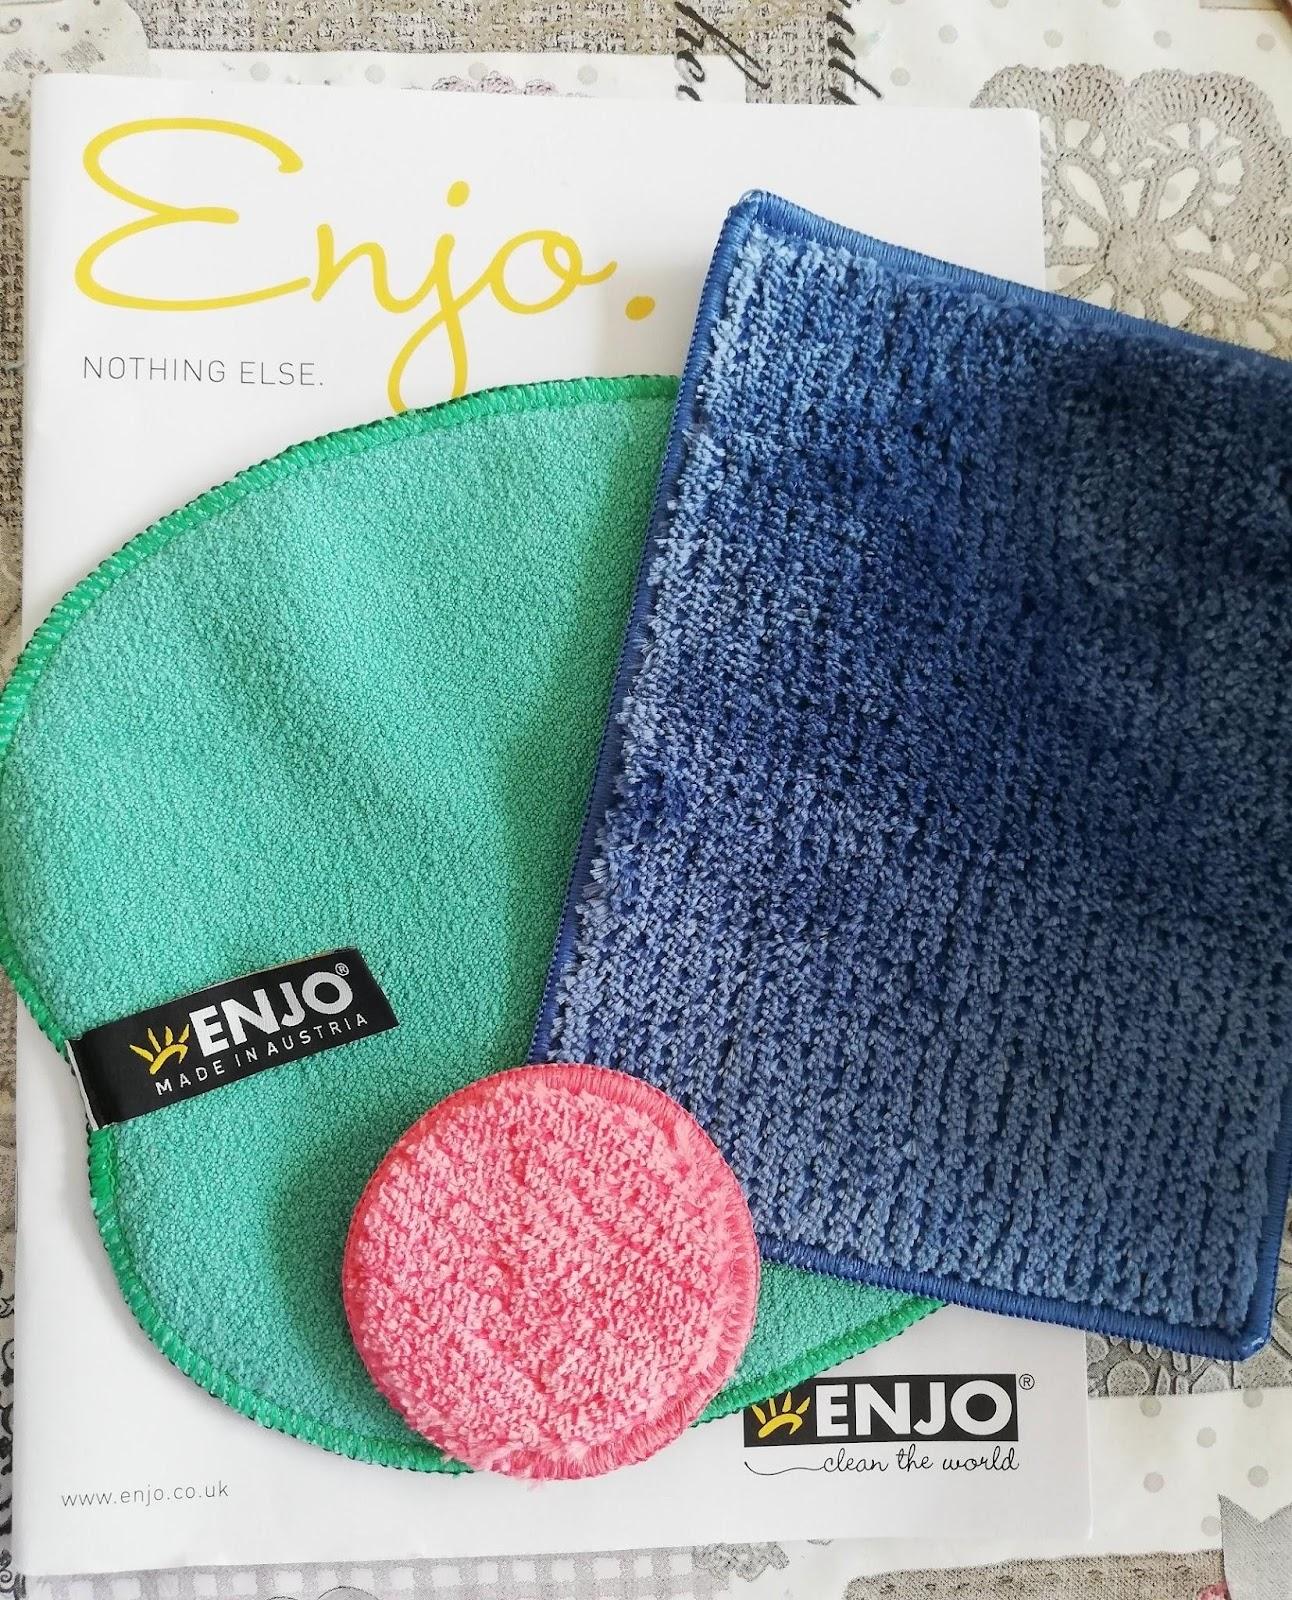 "(<img alt=""ENJO cleaning cloths"">)"